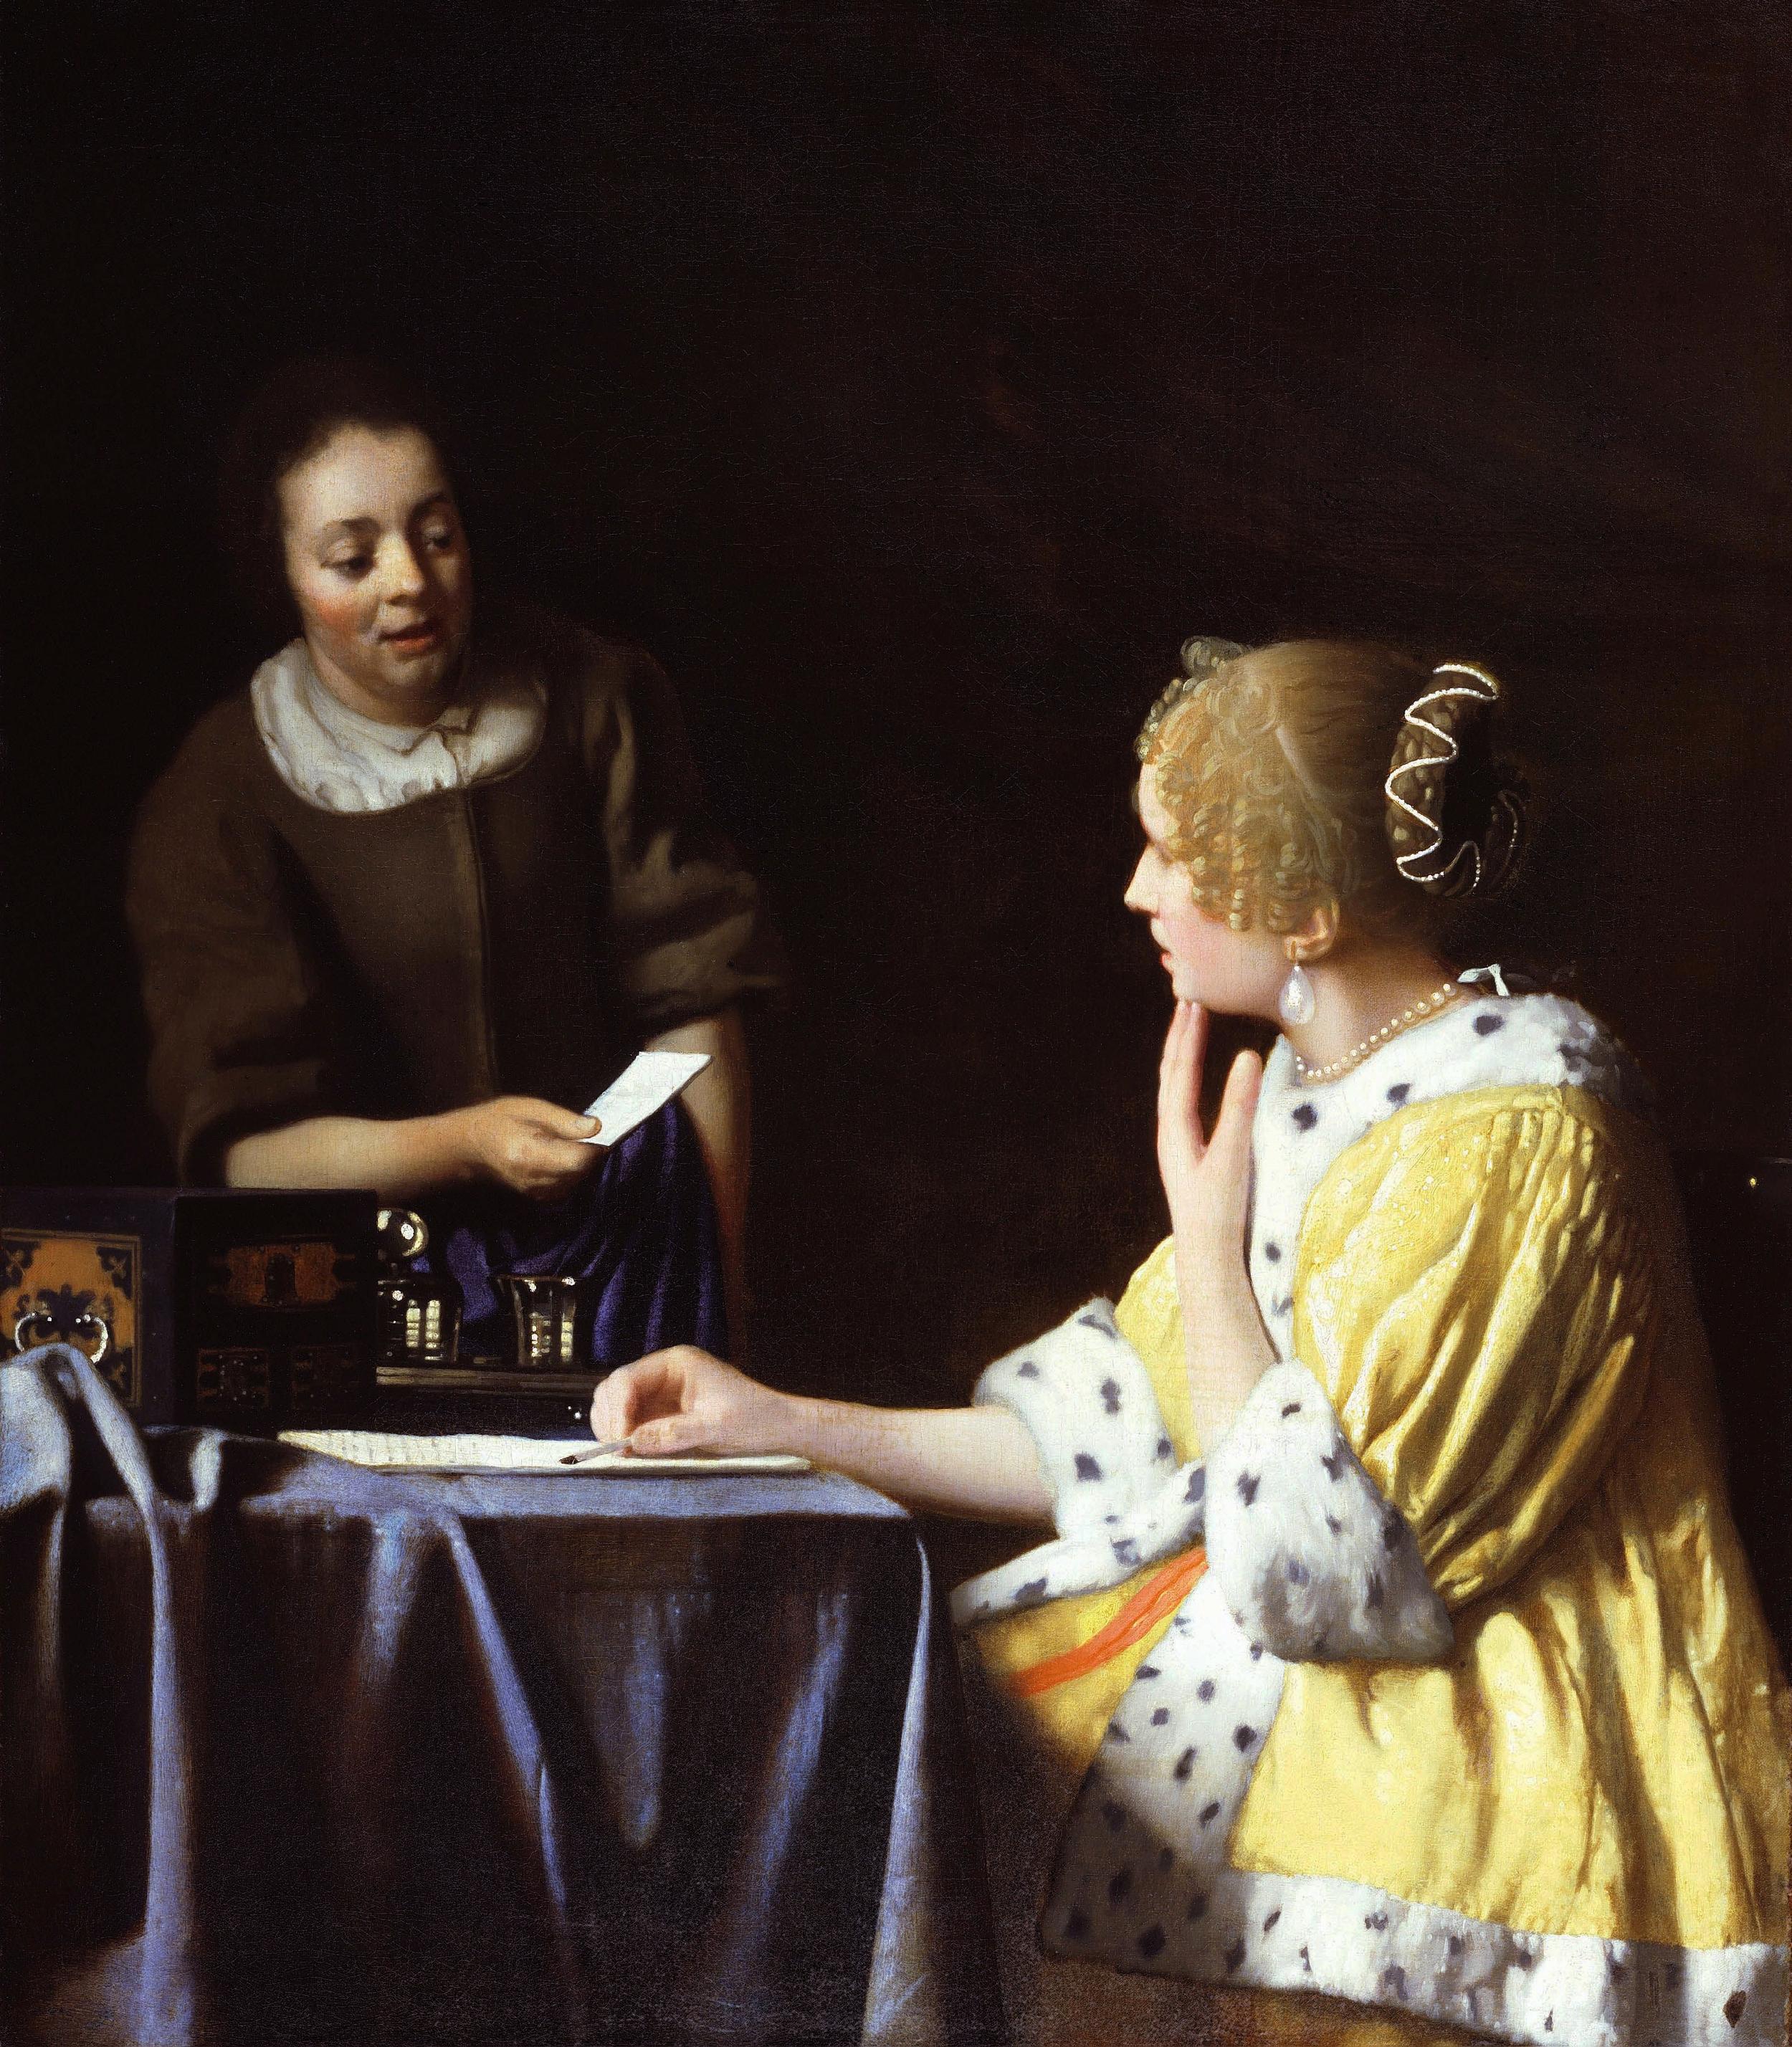 Johannes Vermeer, Mistress and Maid,  1666-67, Oil on canvas